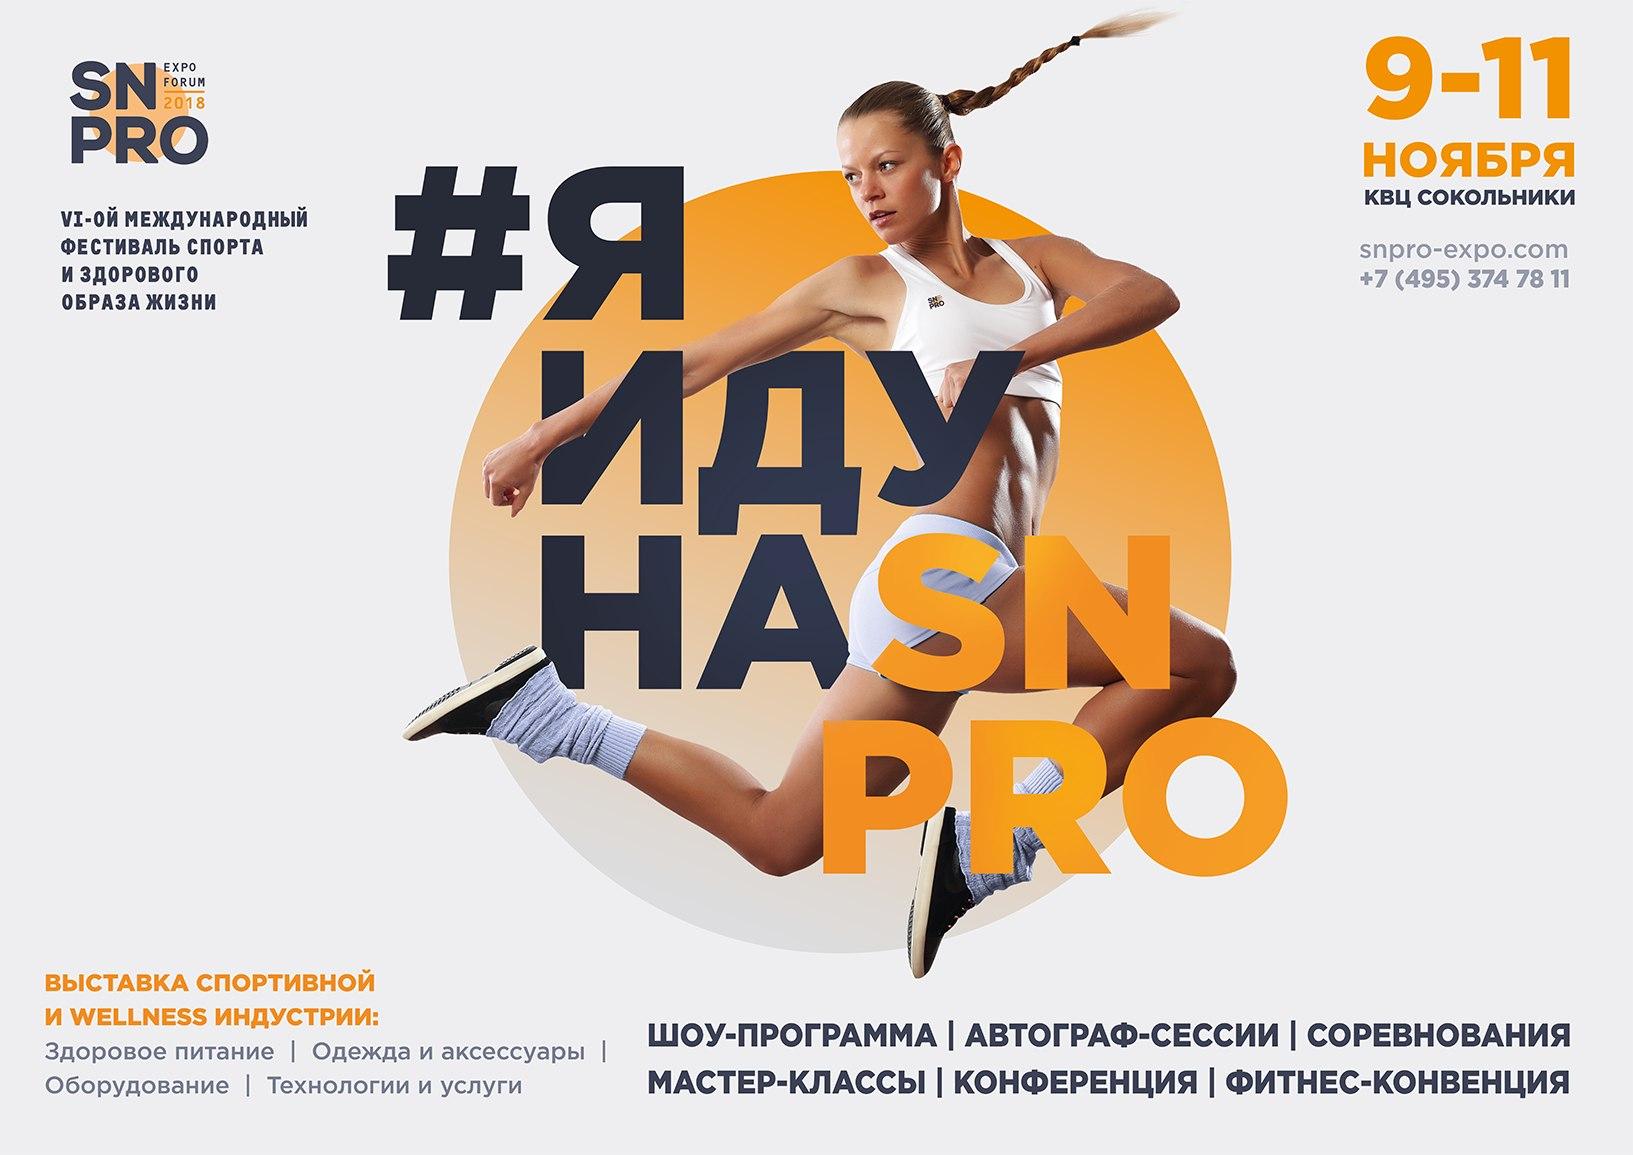 «SN PRO EXPO FORUM» - 2018